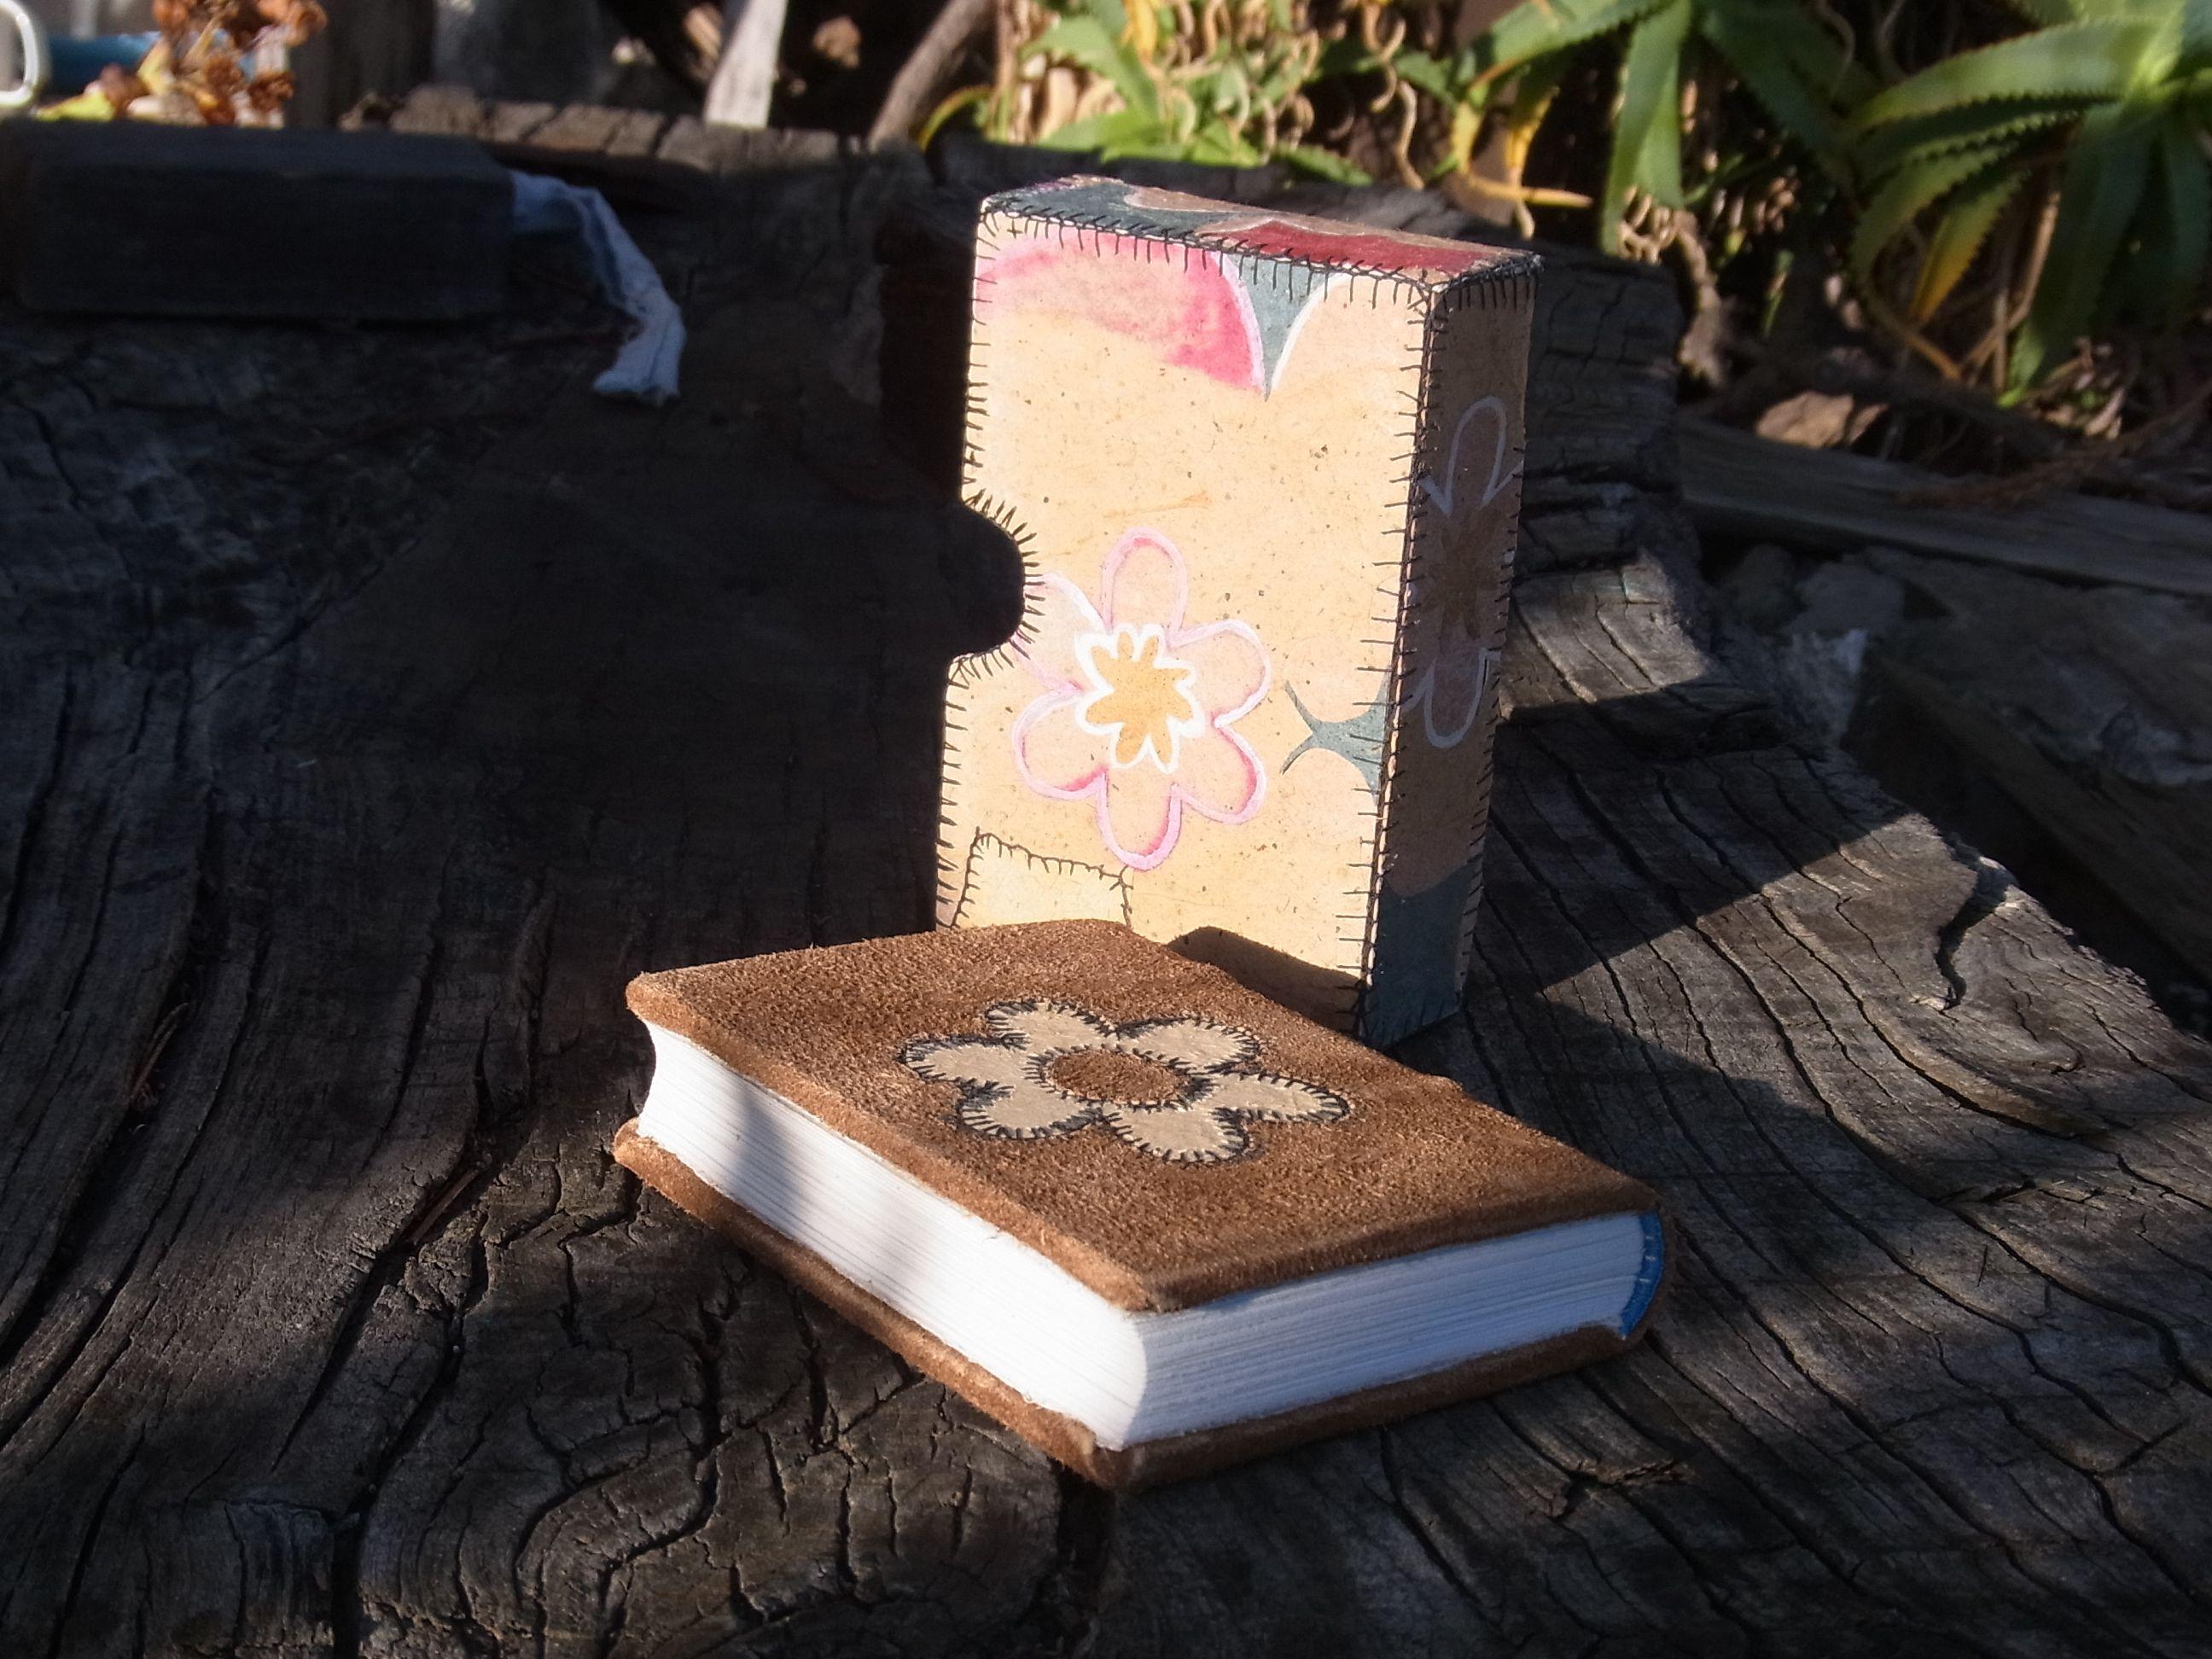 Vista del libro fuera del estuche.